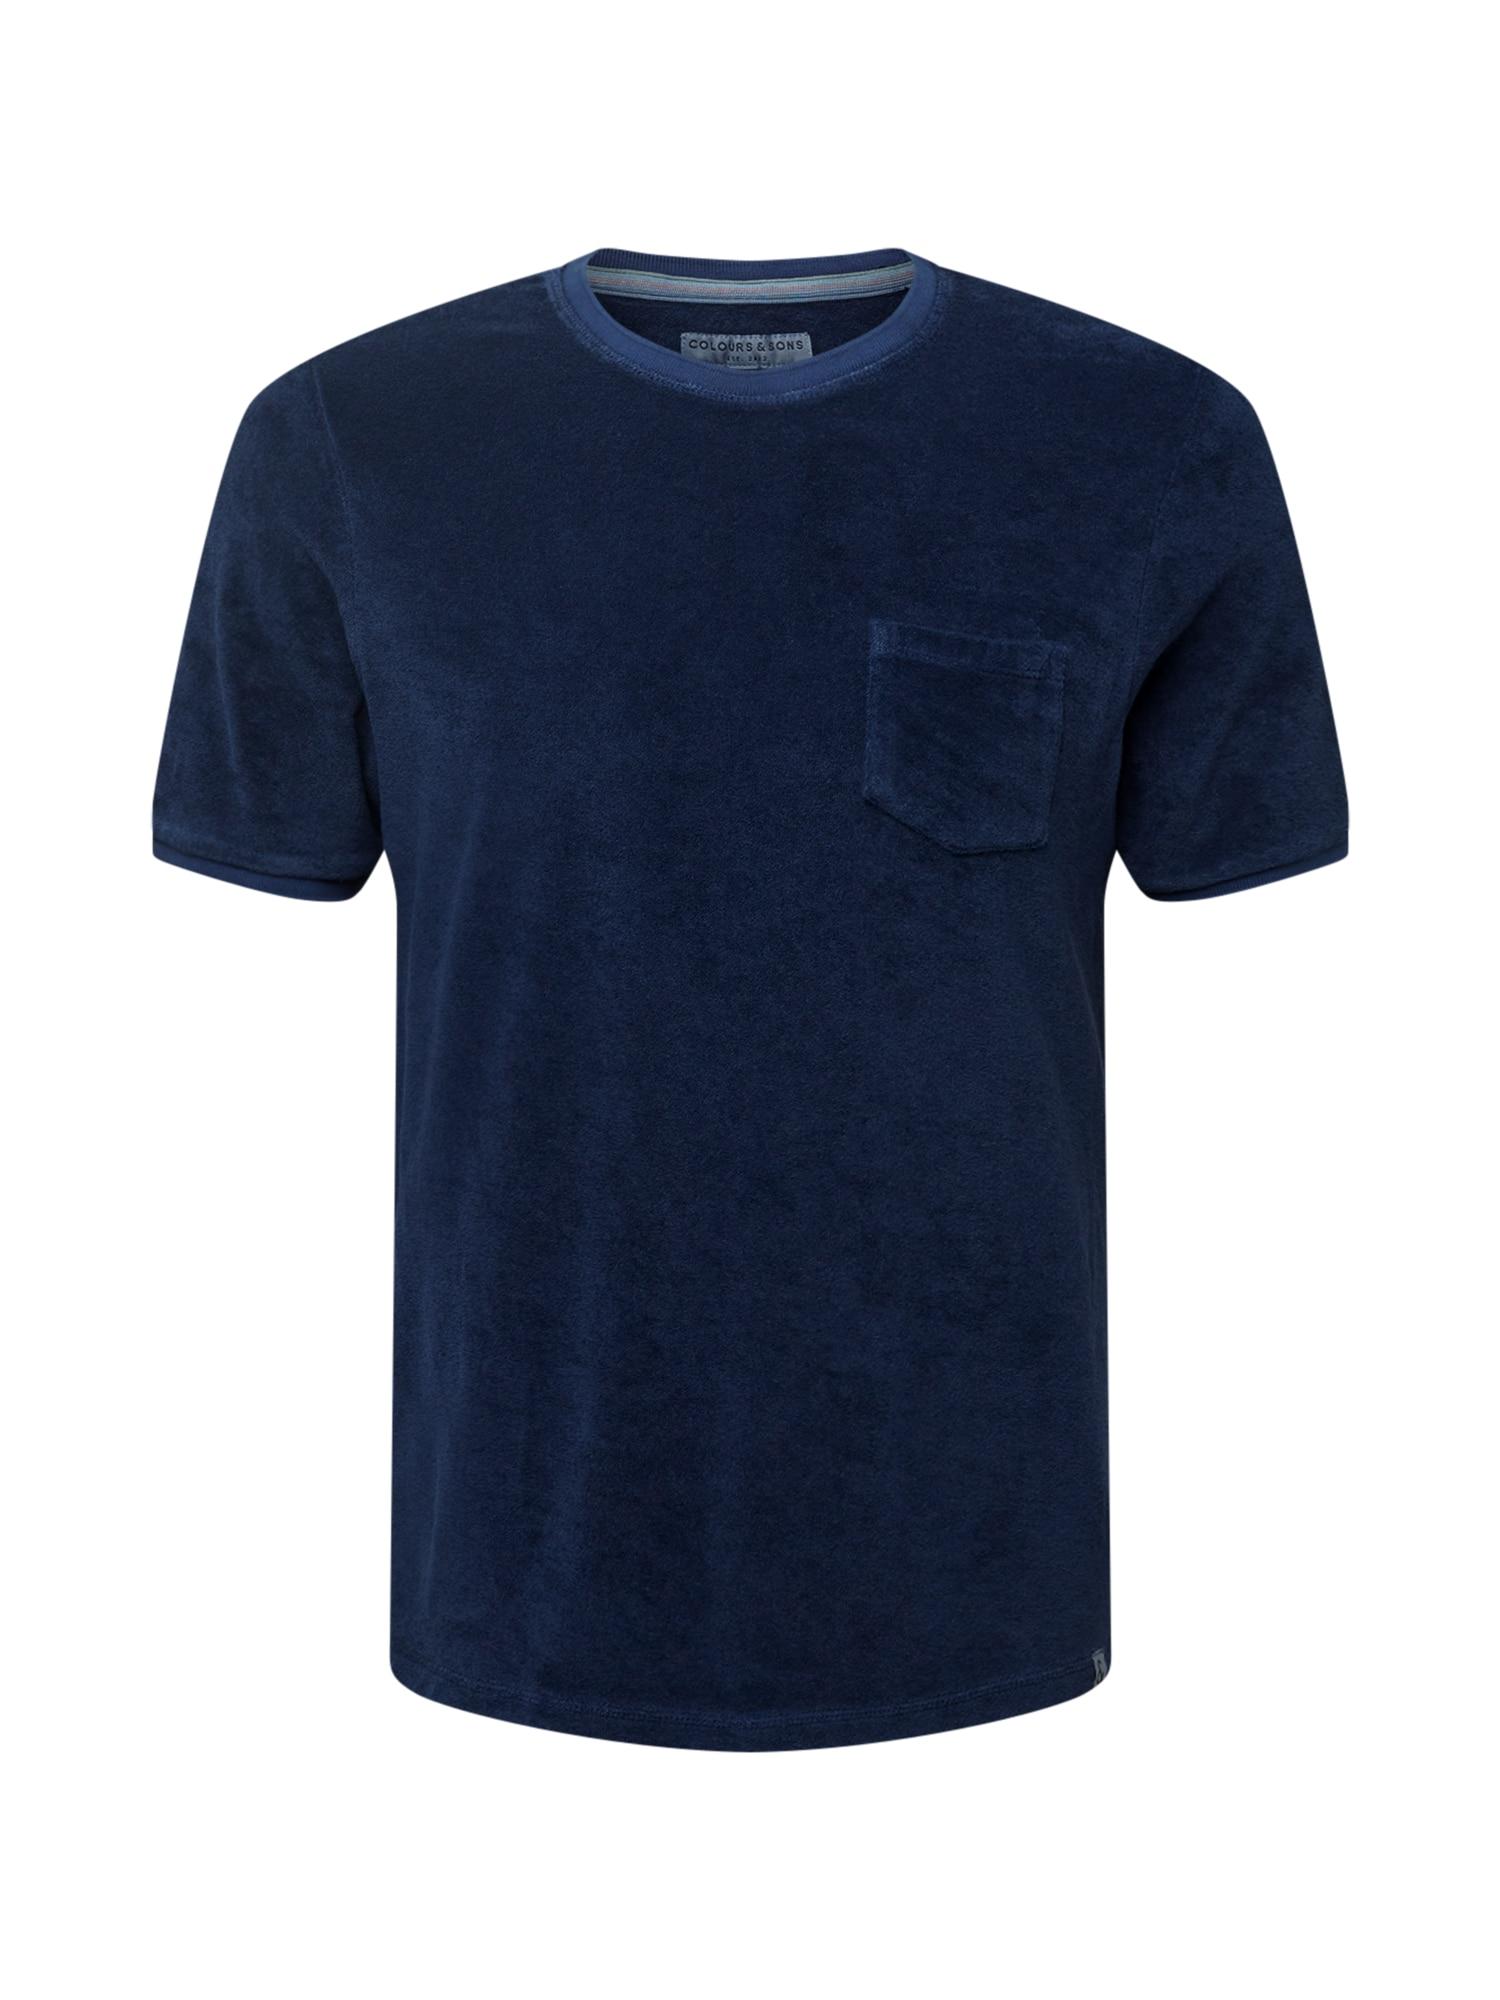 COLOURS & SONS Marškinėliai tamsiai mėlyna